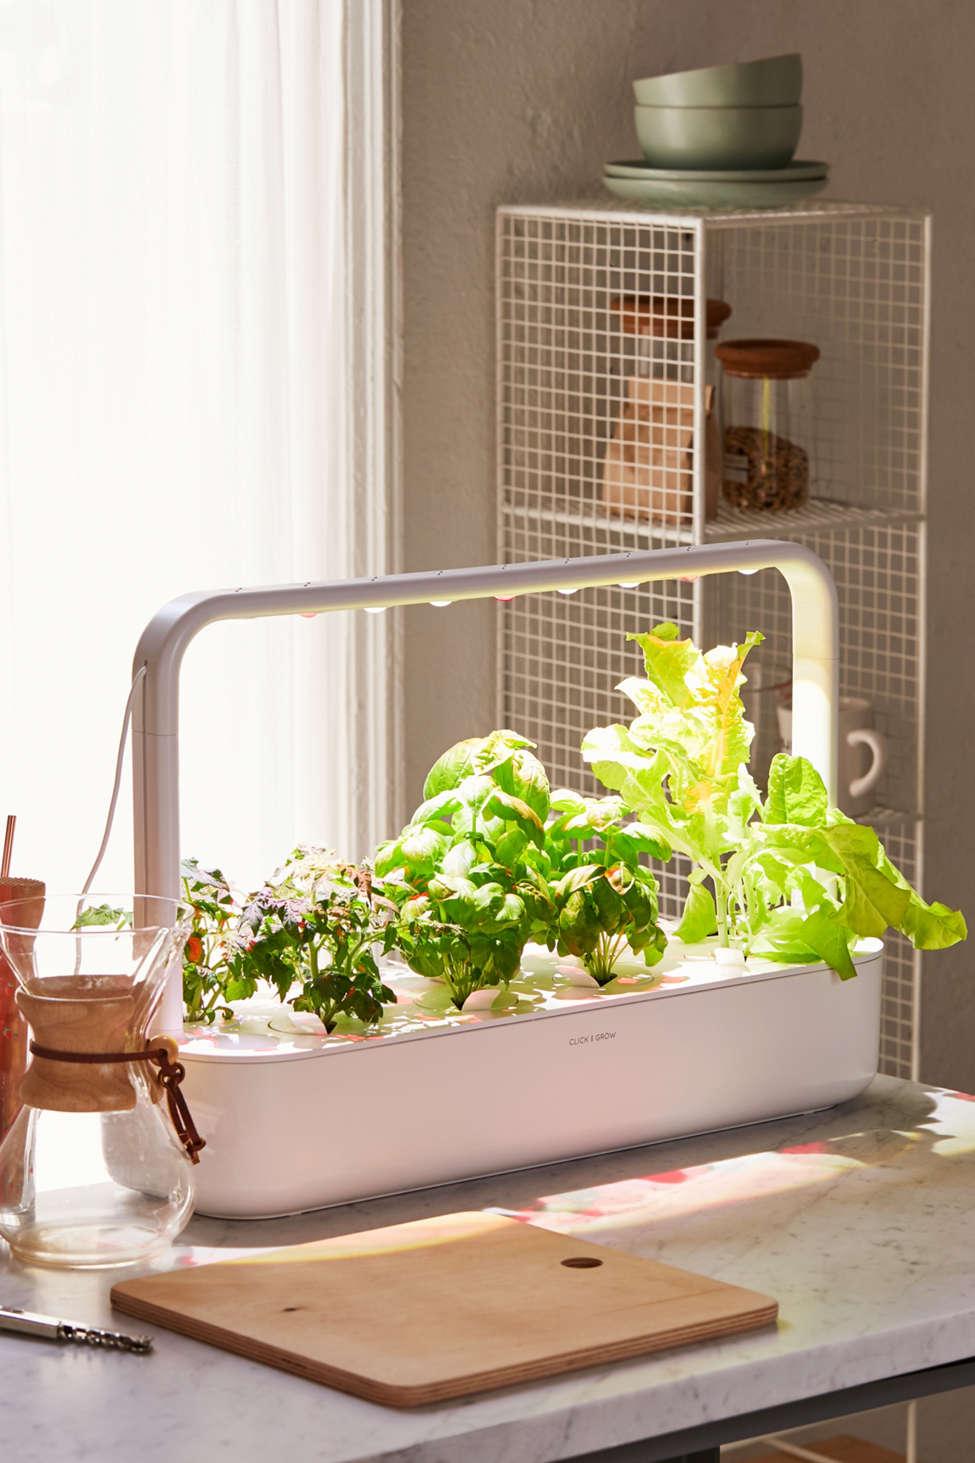 Slide View: 1: Click & Grow Smart Garden 9